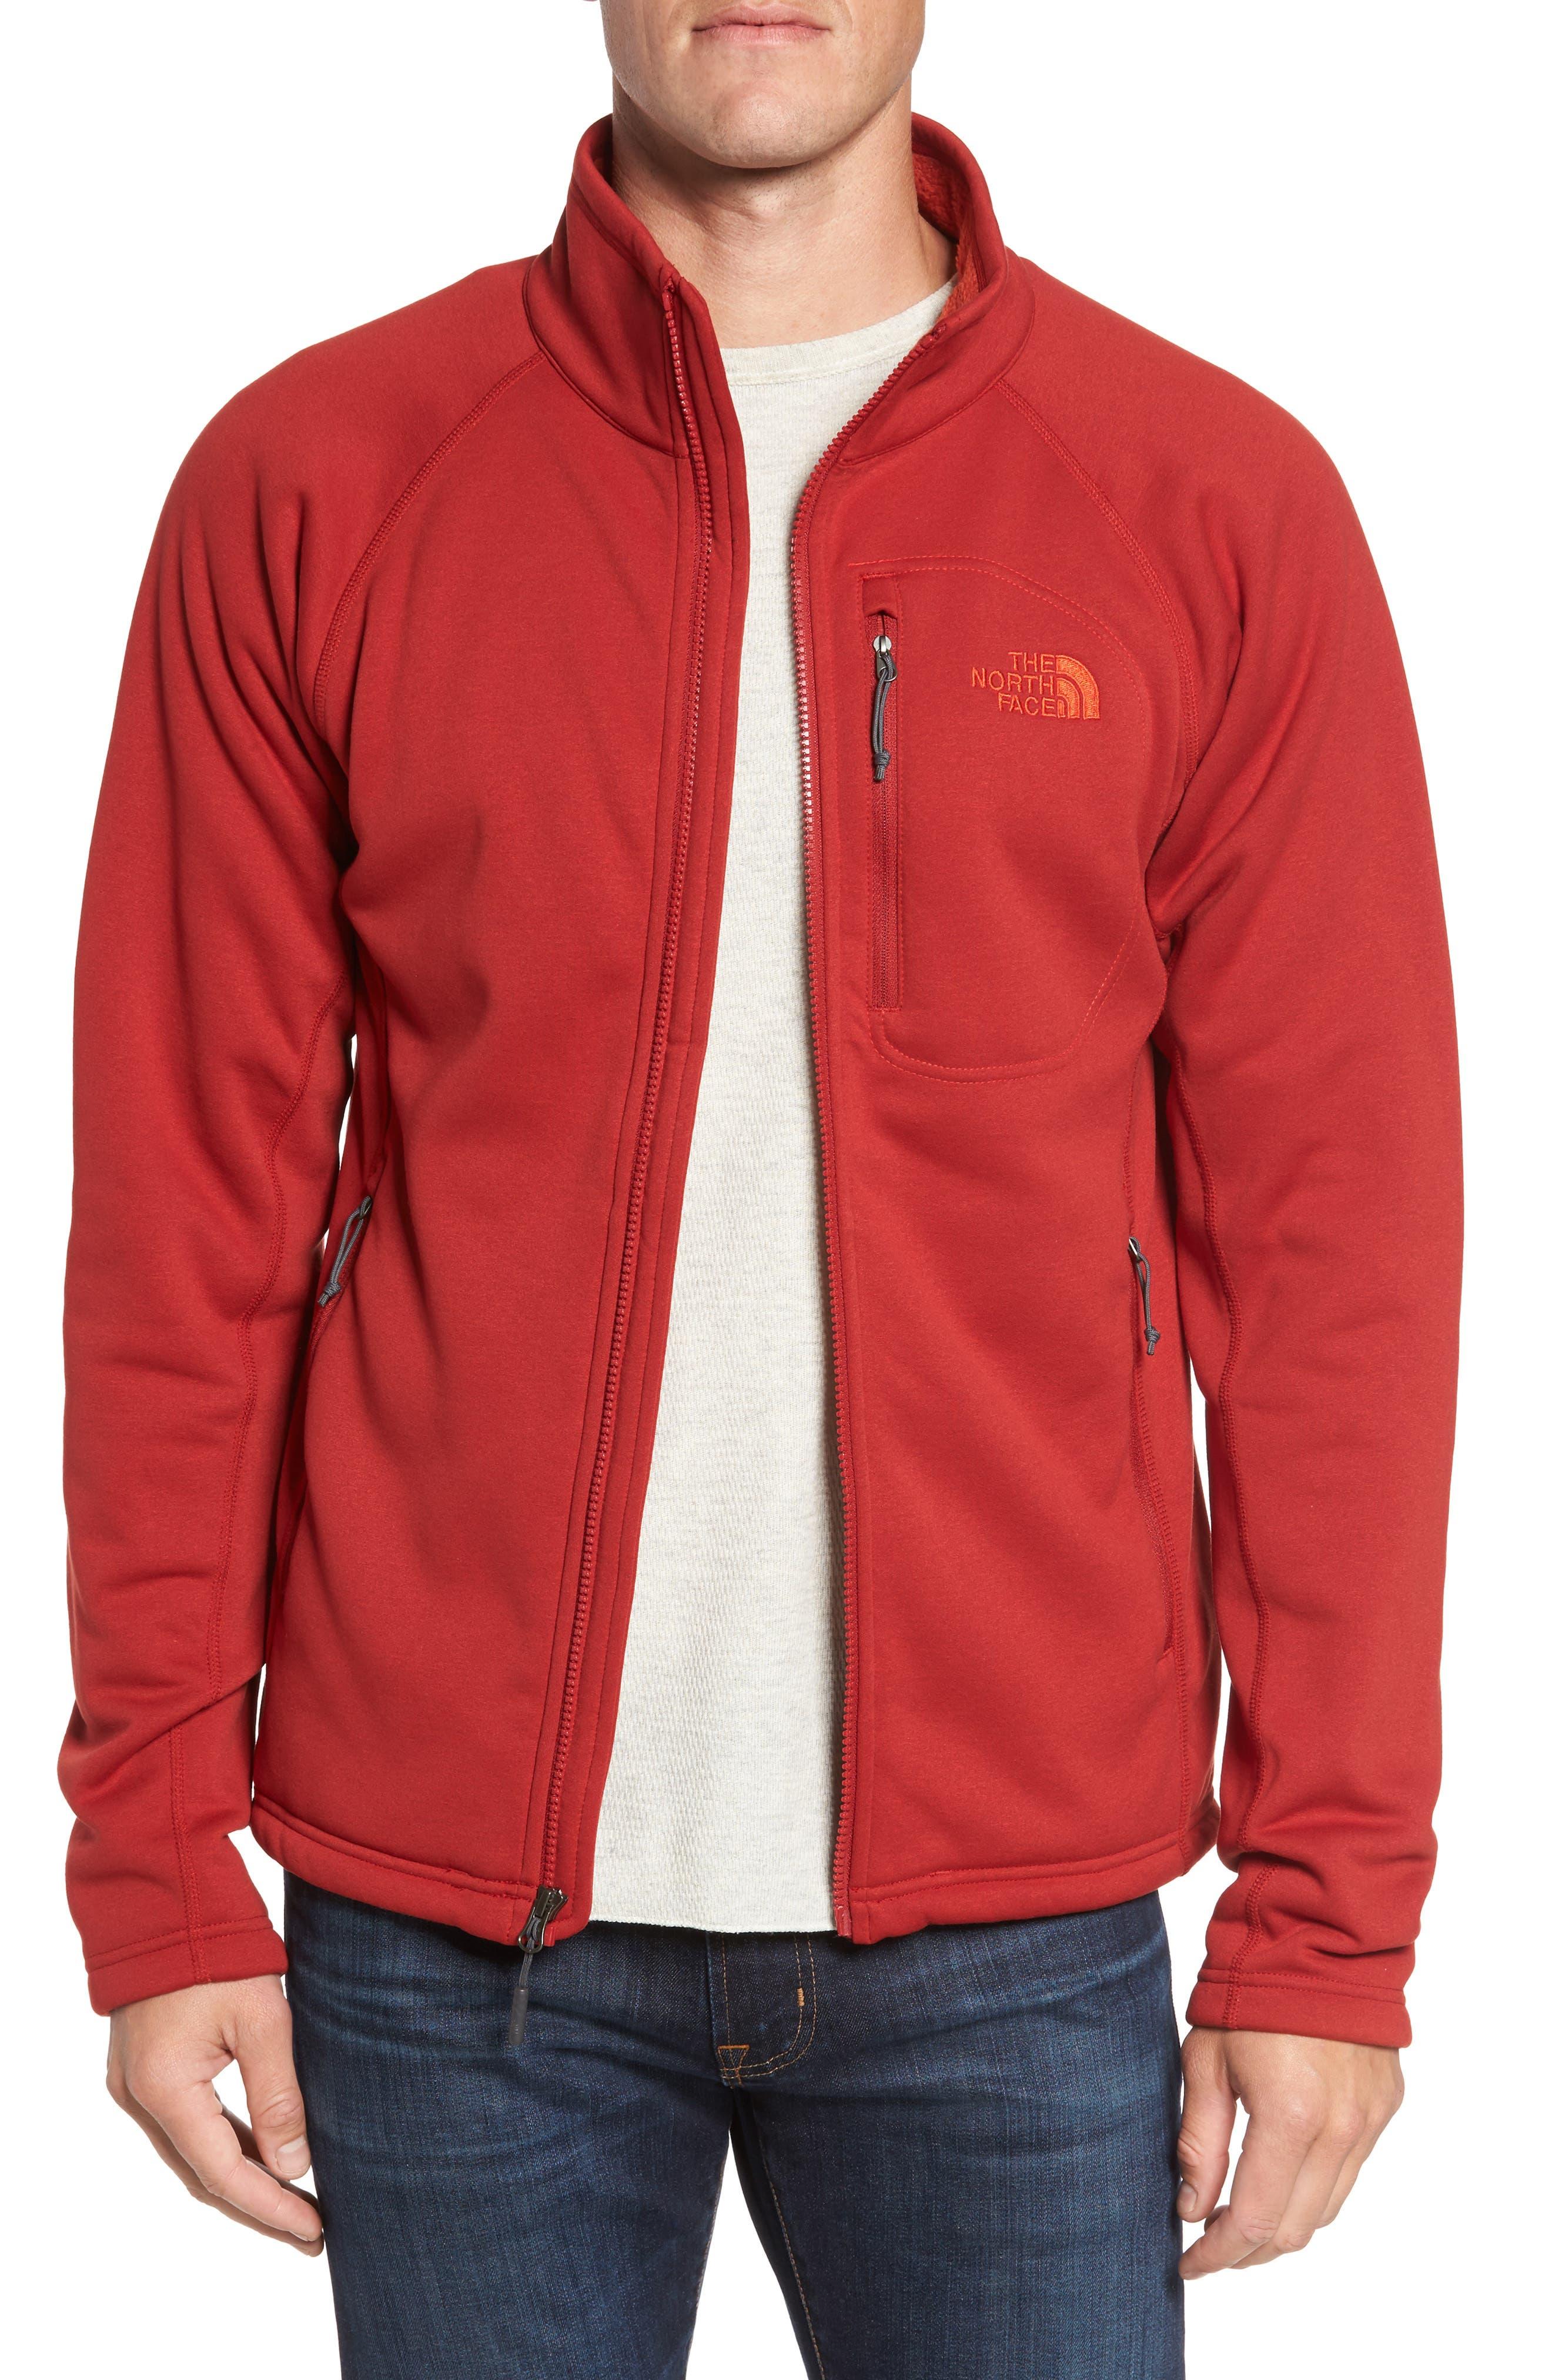 Main Image - The North Face Timber Zip Jacket